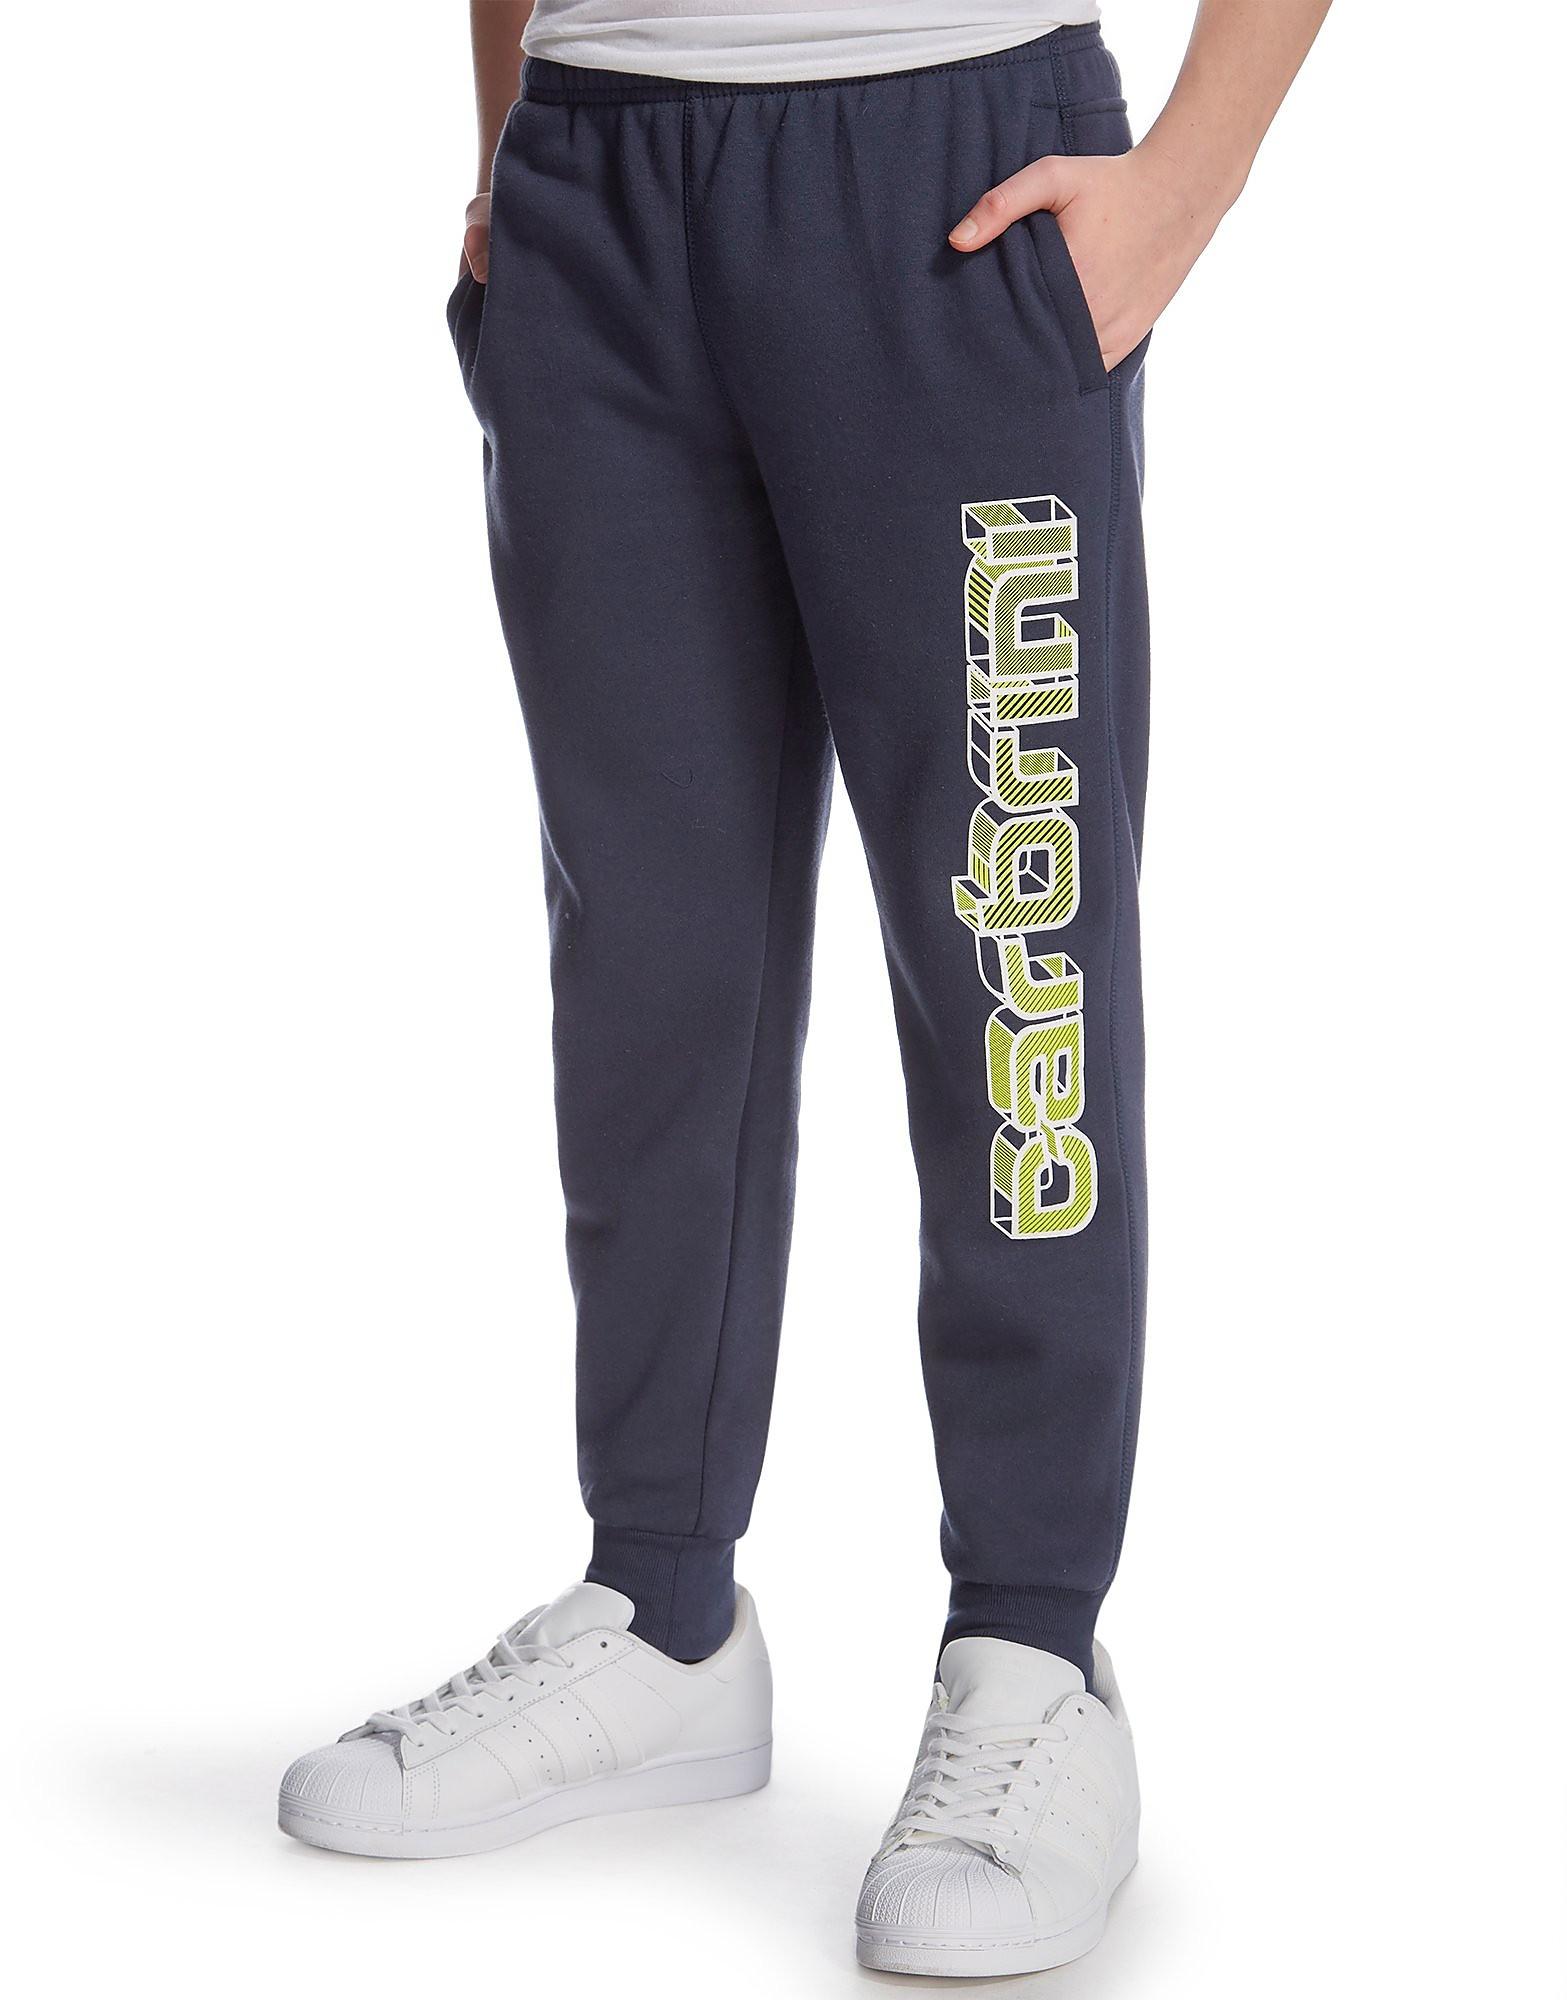 Carbrini Inferno Jogging Pants Junior